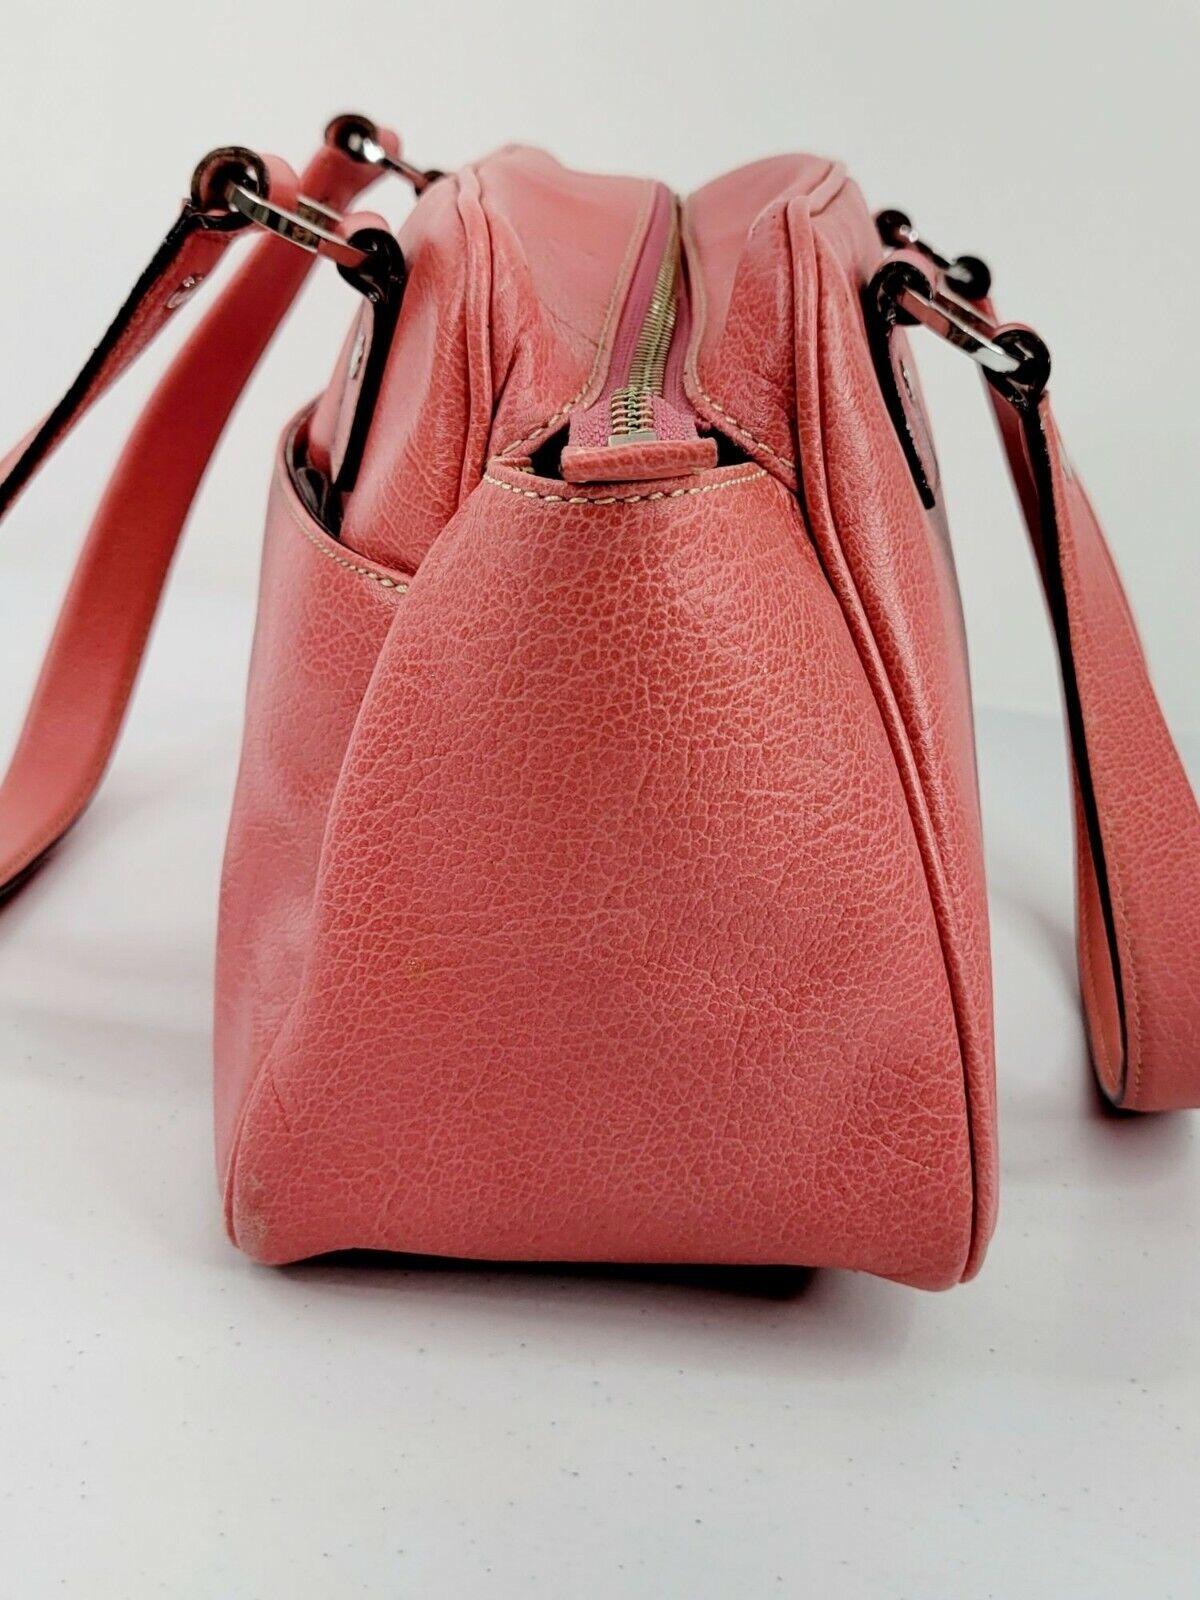 Kate Spade New York Bubblegum Pink Leather Satche… - image 3